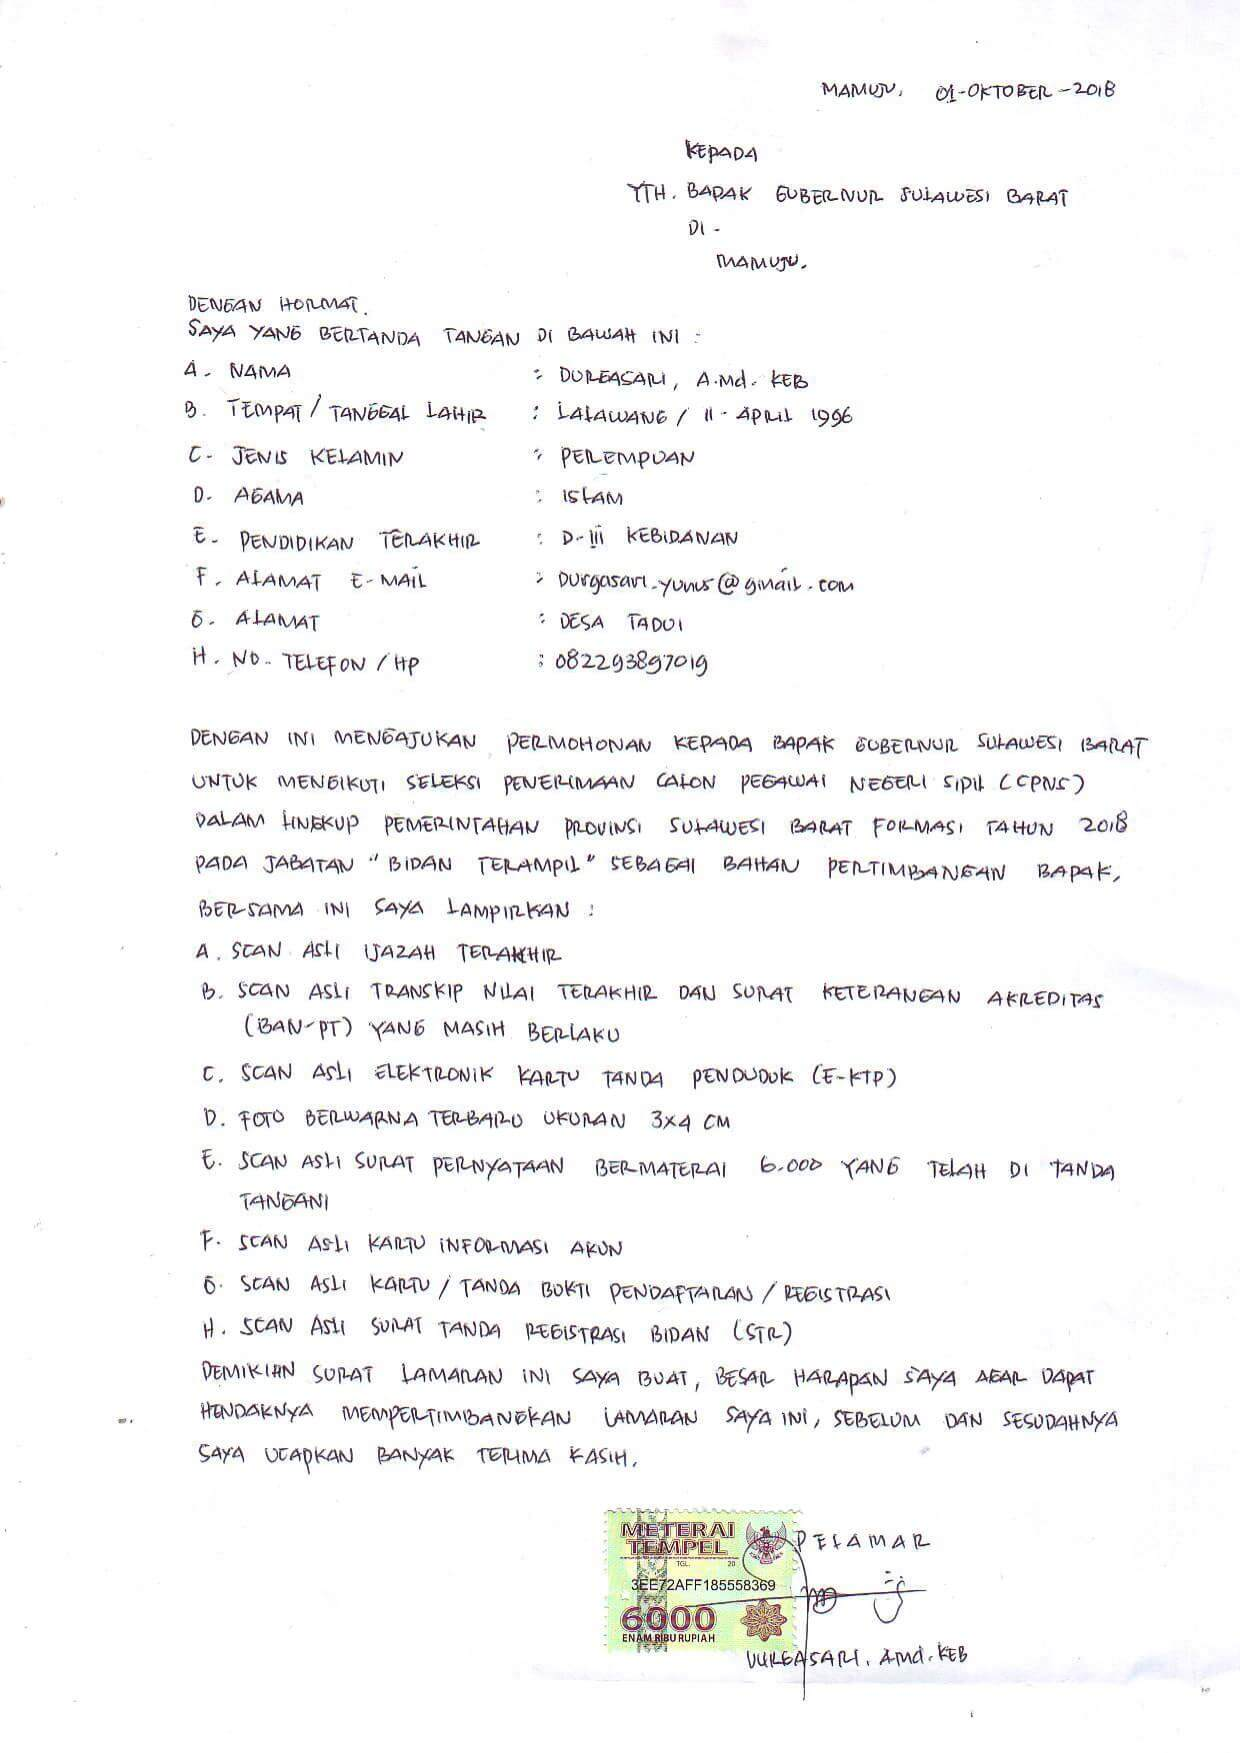 Contoh Surat Lamaran Kerja Rumah Sakit Tulis Tangan